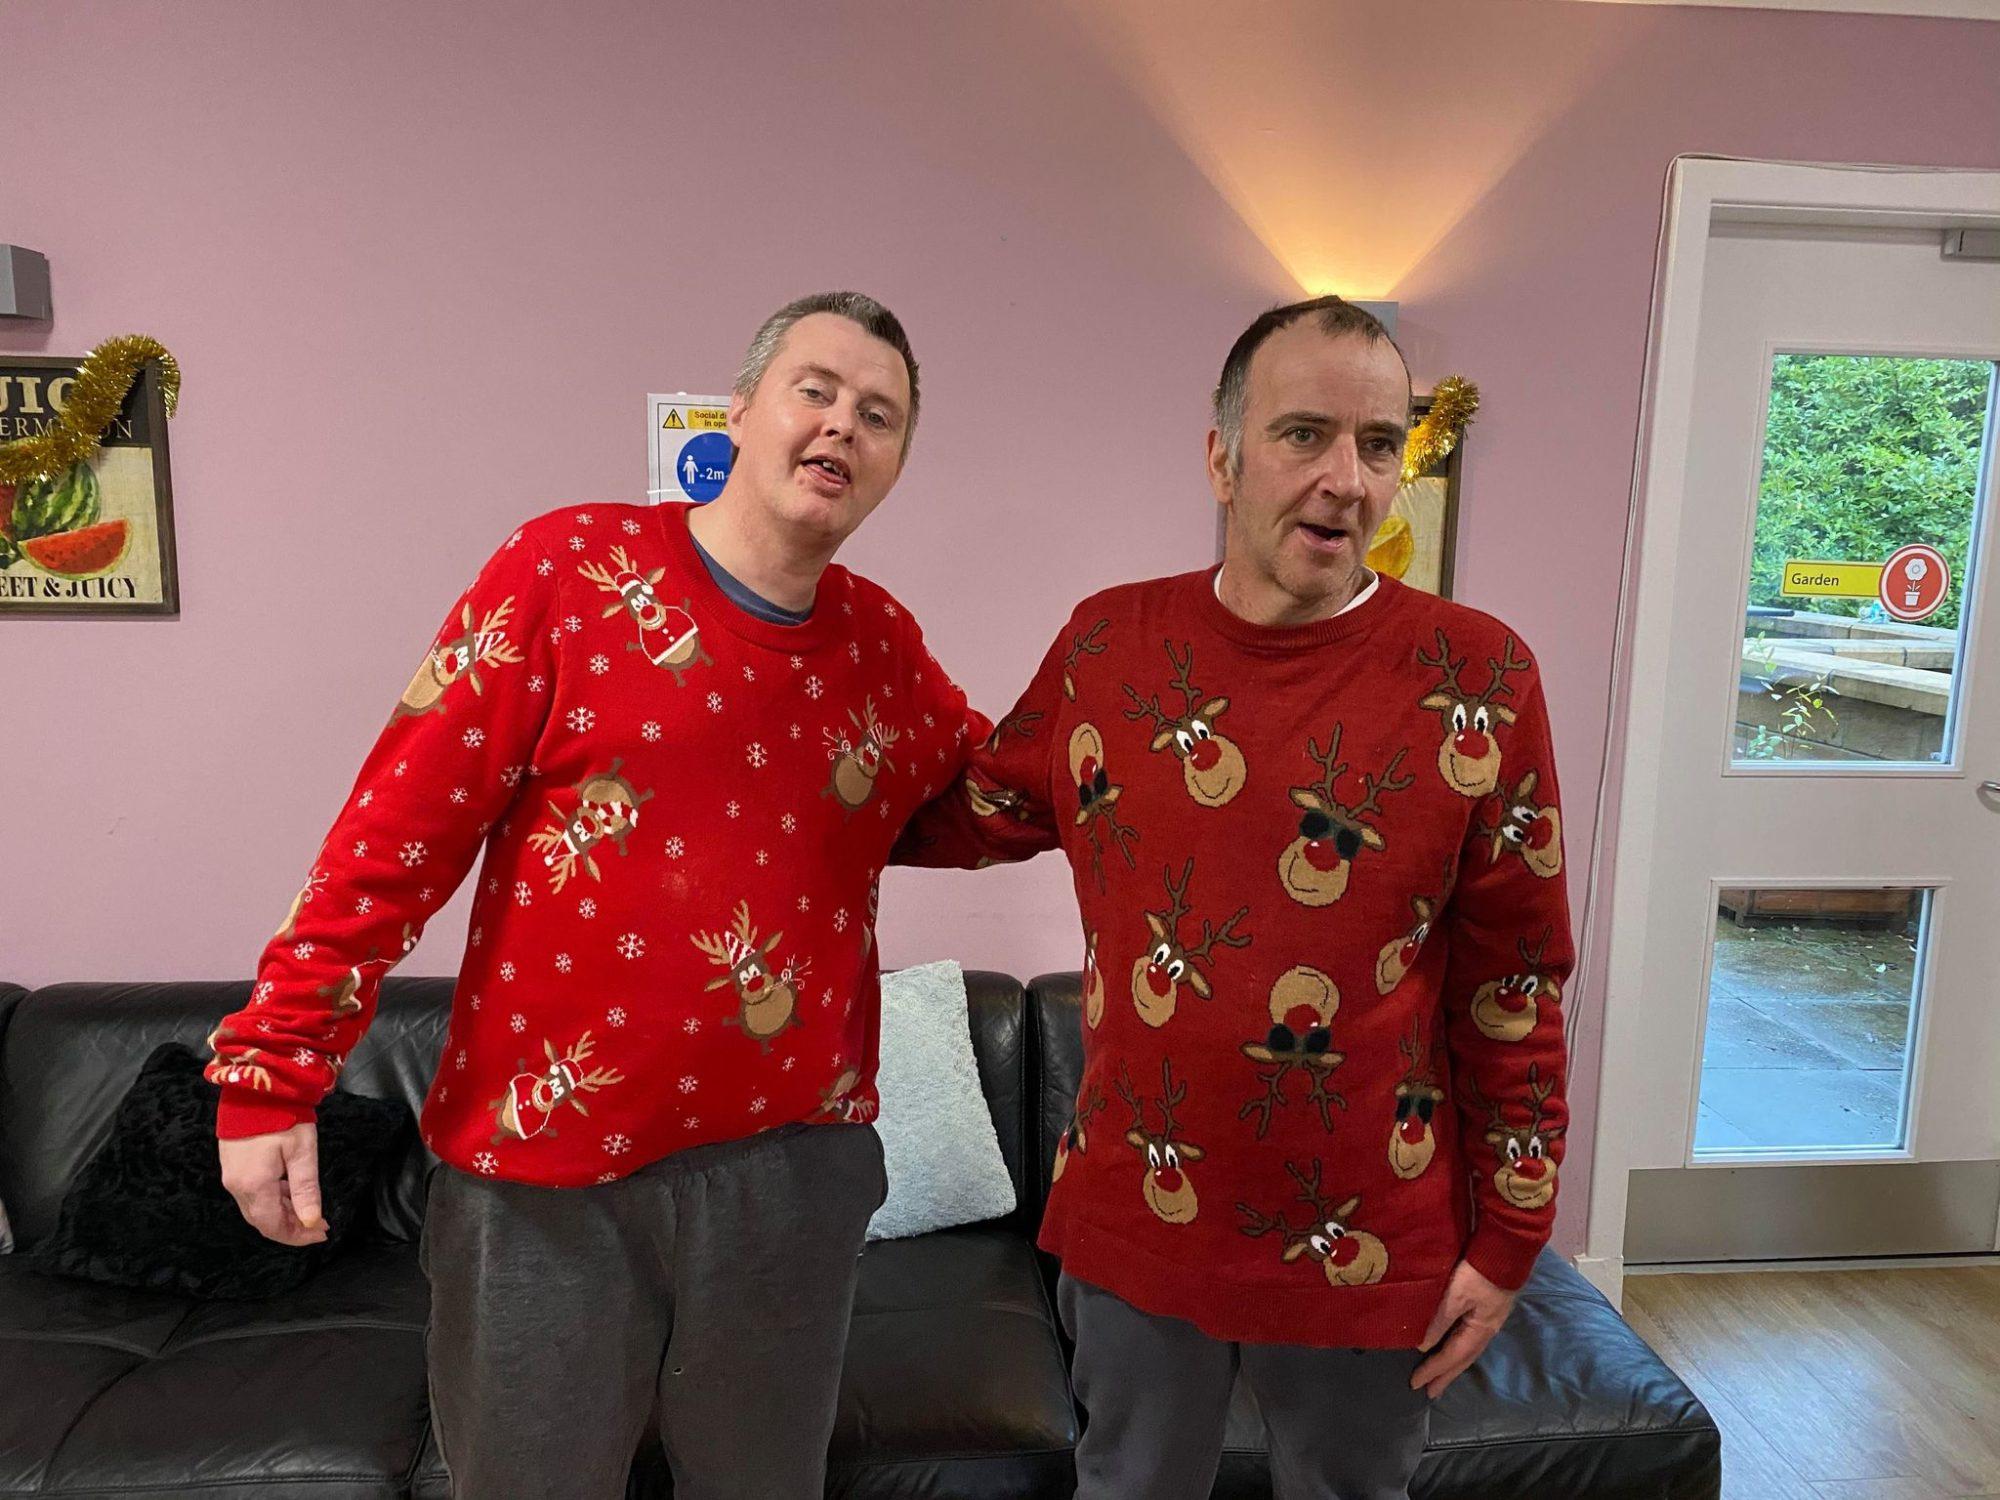 Residents feeling festive at Rumbling Bridge